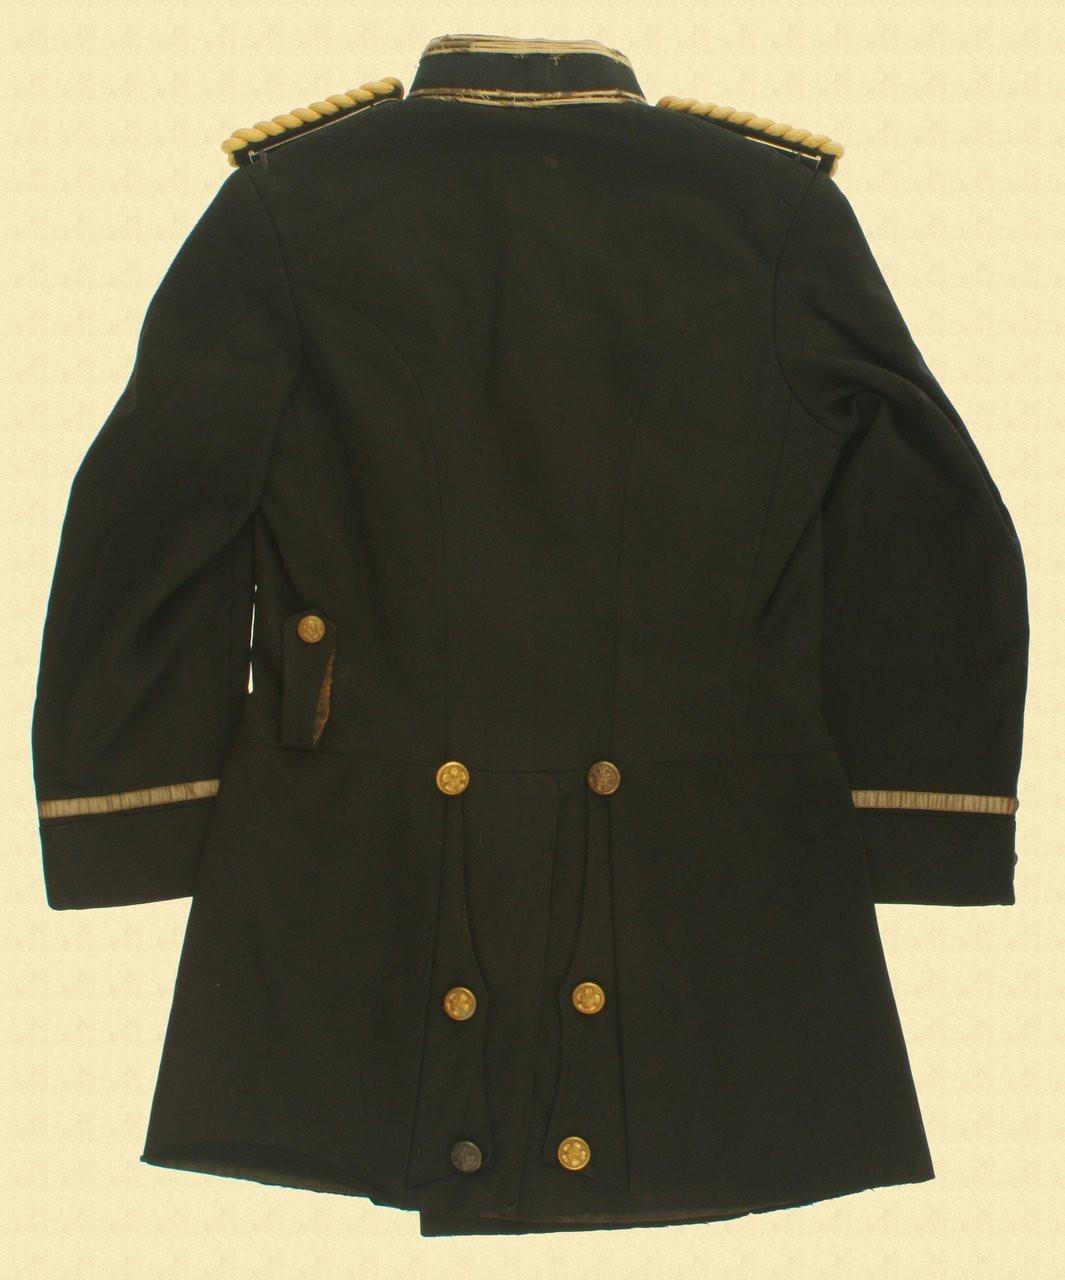 JAPANESE IJA FULL DRESS UNIFORM - C12332